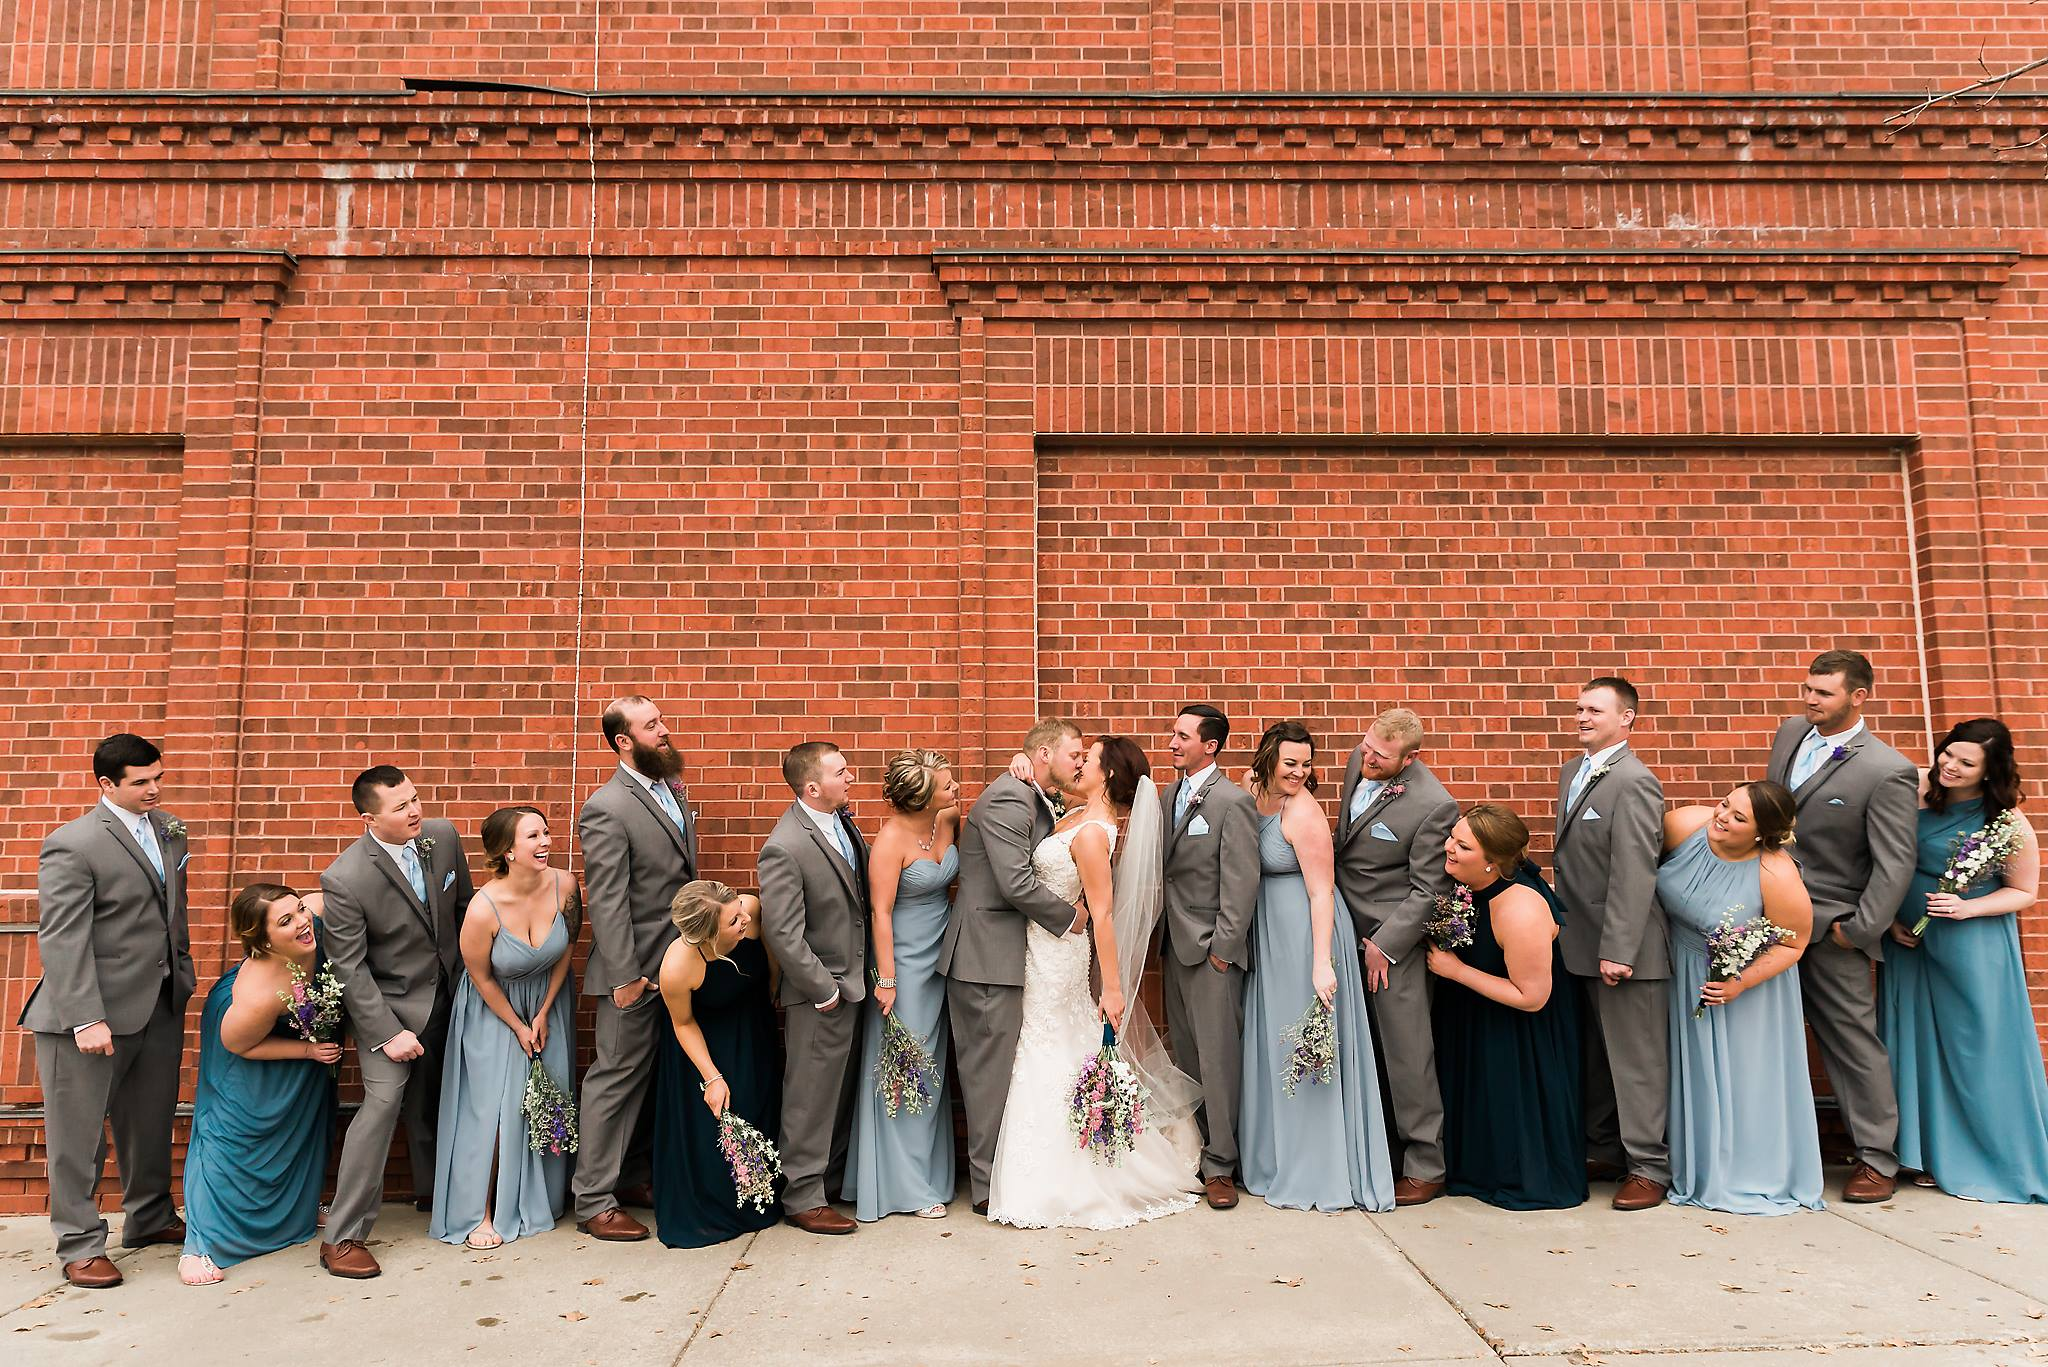 Wedding party photos on Mass st.